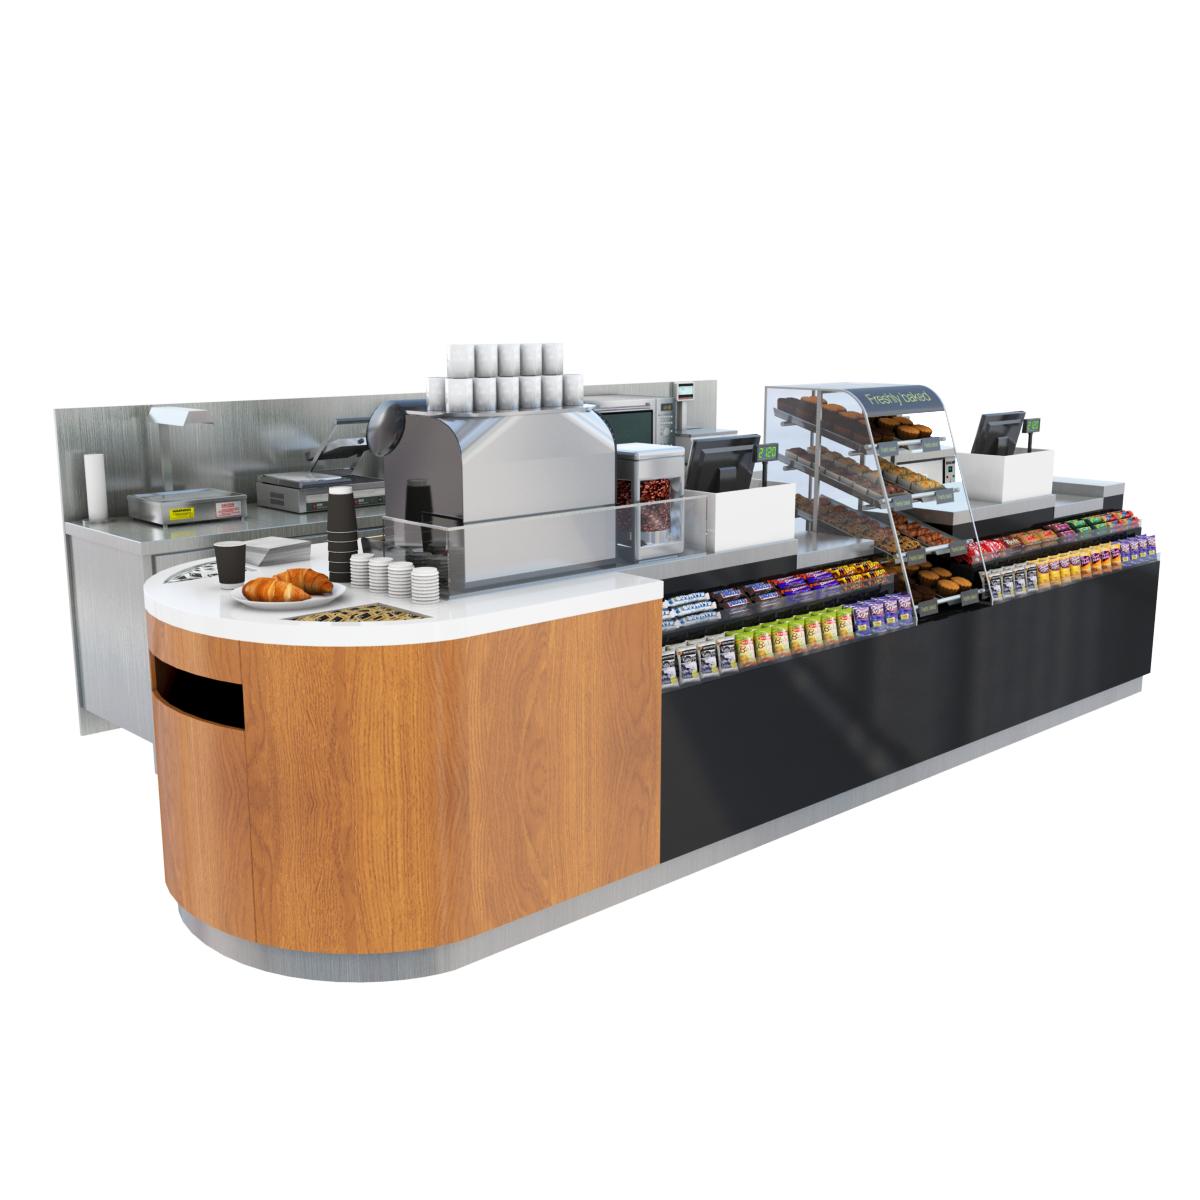 Coffee Shop Counters Layout - einaioipoliseisvlaka